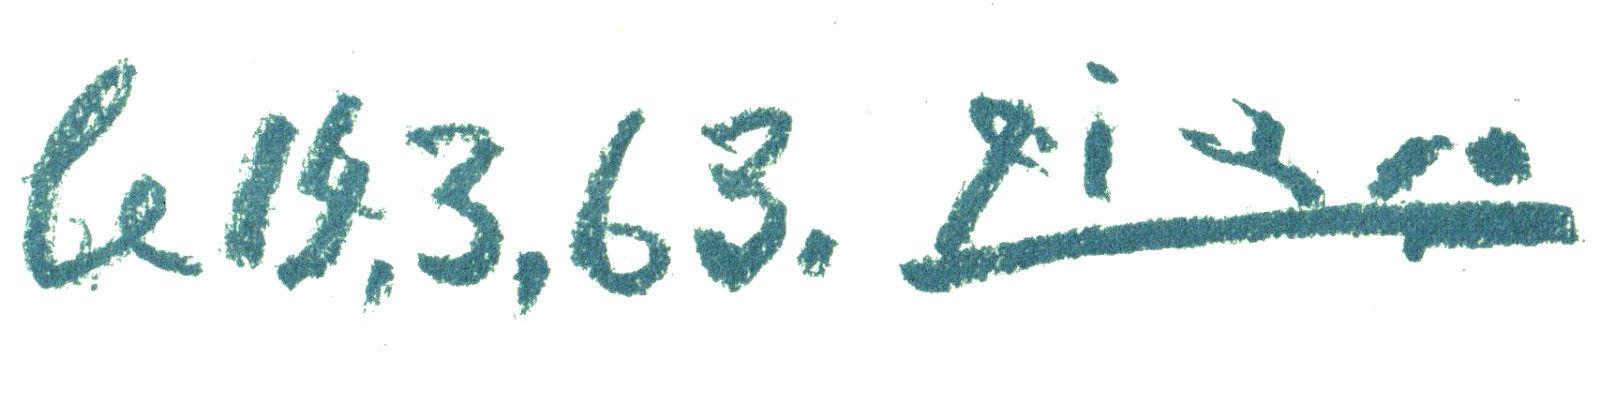 PICASSO LITHOGRAPH SIGNED w/COA. UNIQUE 1960s Pablo Picasso £ EXTREMELY RARE ART